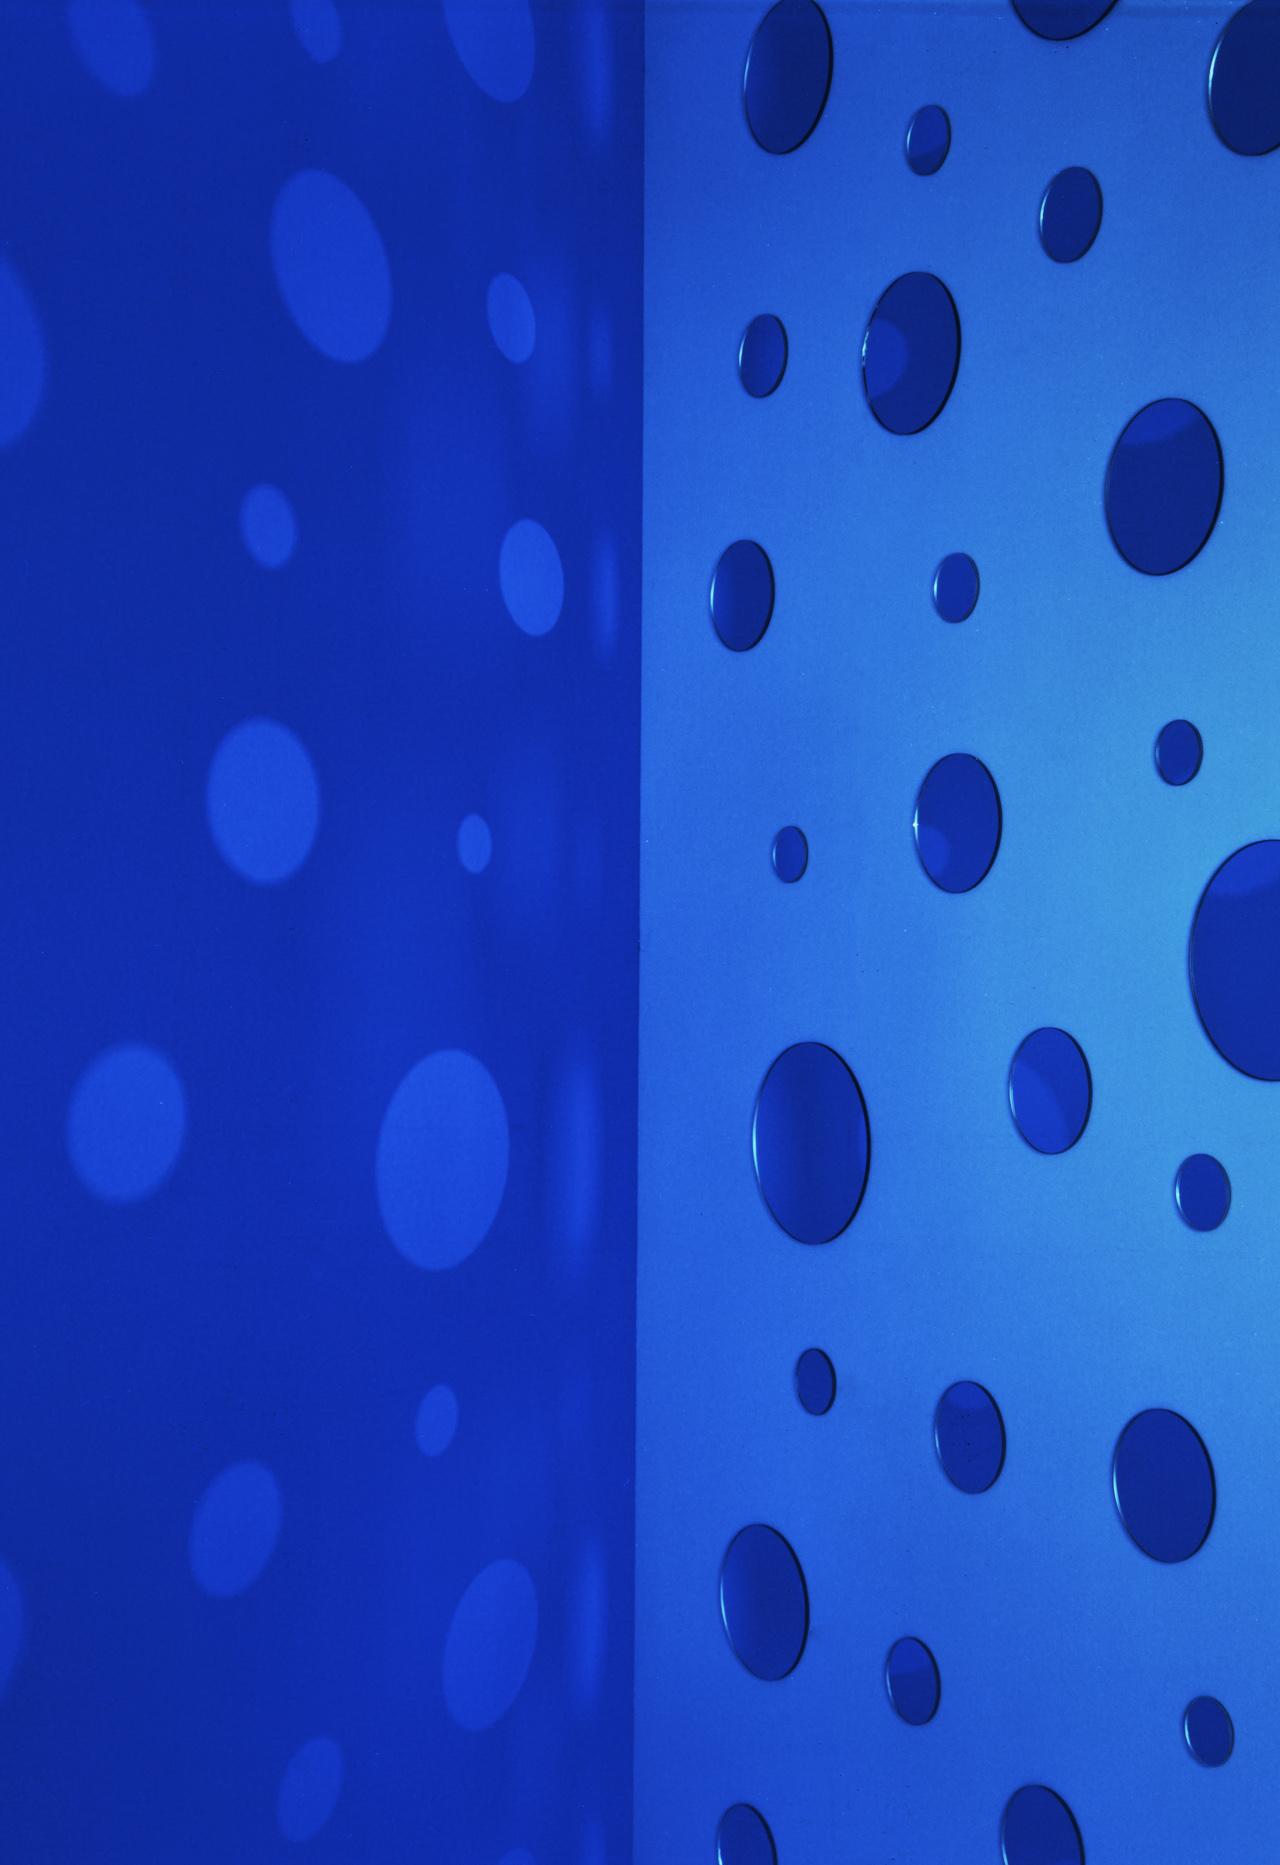 JACKY REDGATE   Light Throw (Mirrors) Fold - Blue and Light Blue  2018 Chromogenic photograph handprinted 185 x 127 cm